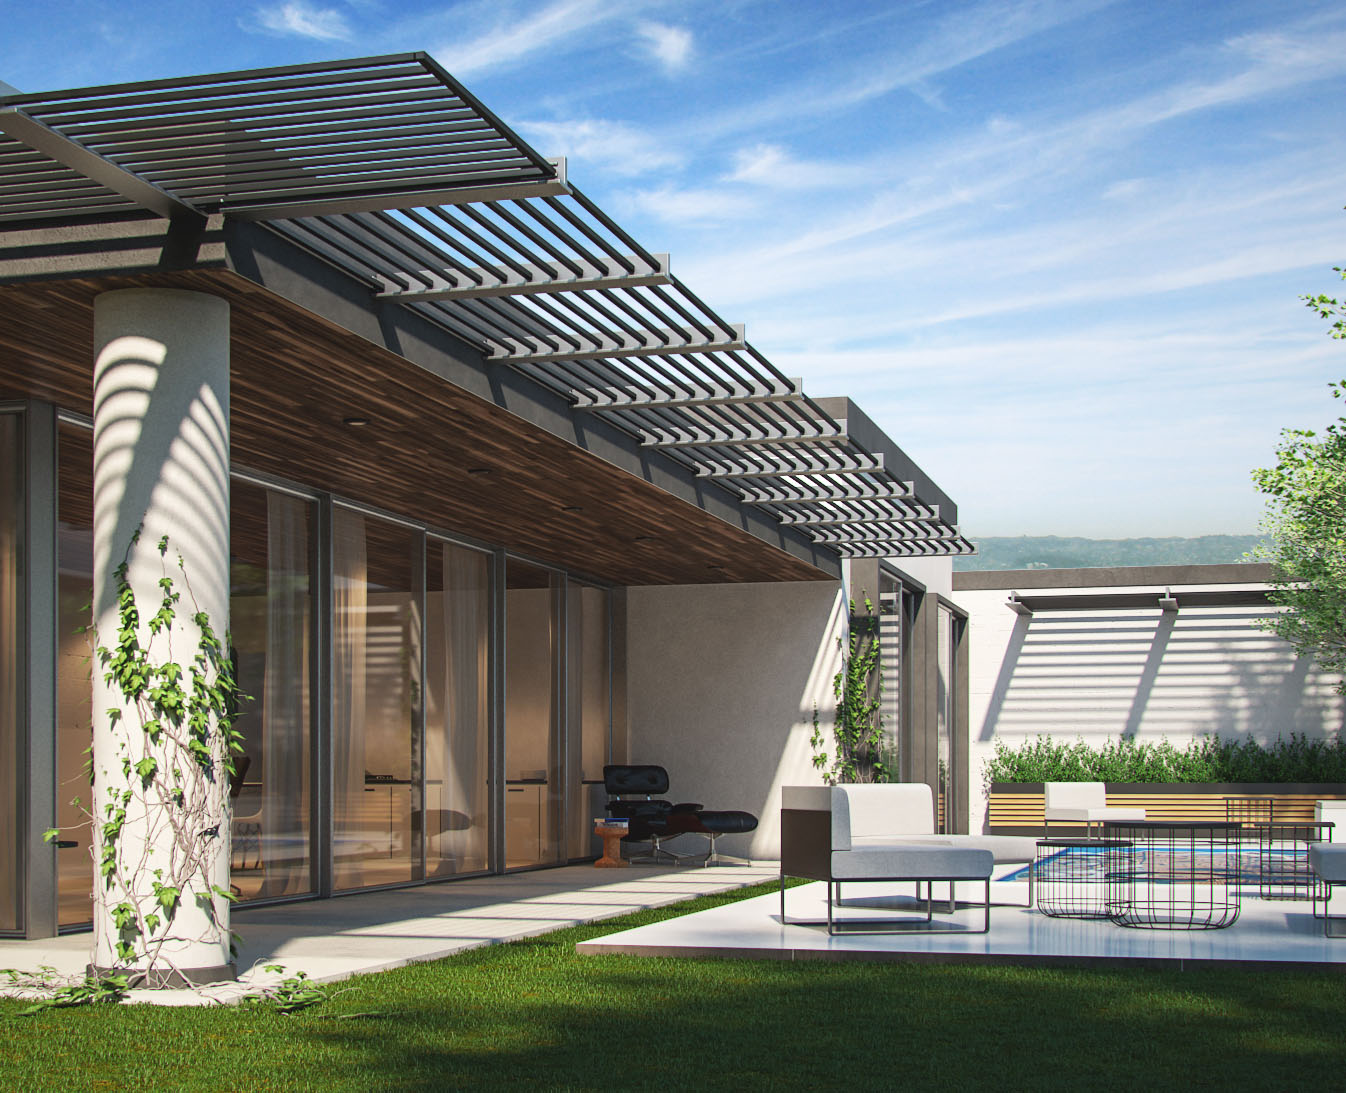 Residential-Exterior-Final-render-tutorial-exterior3d